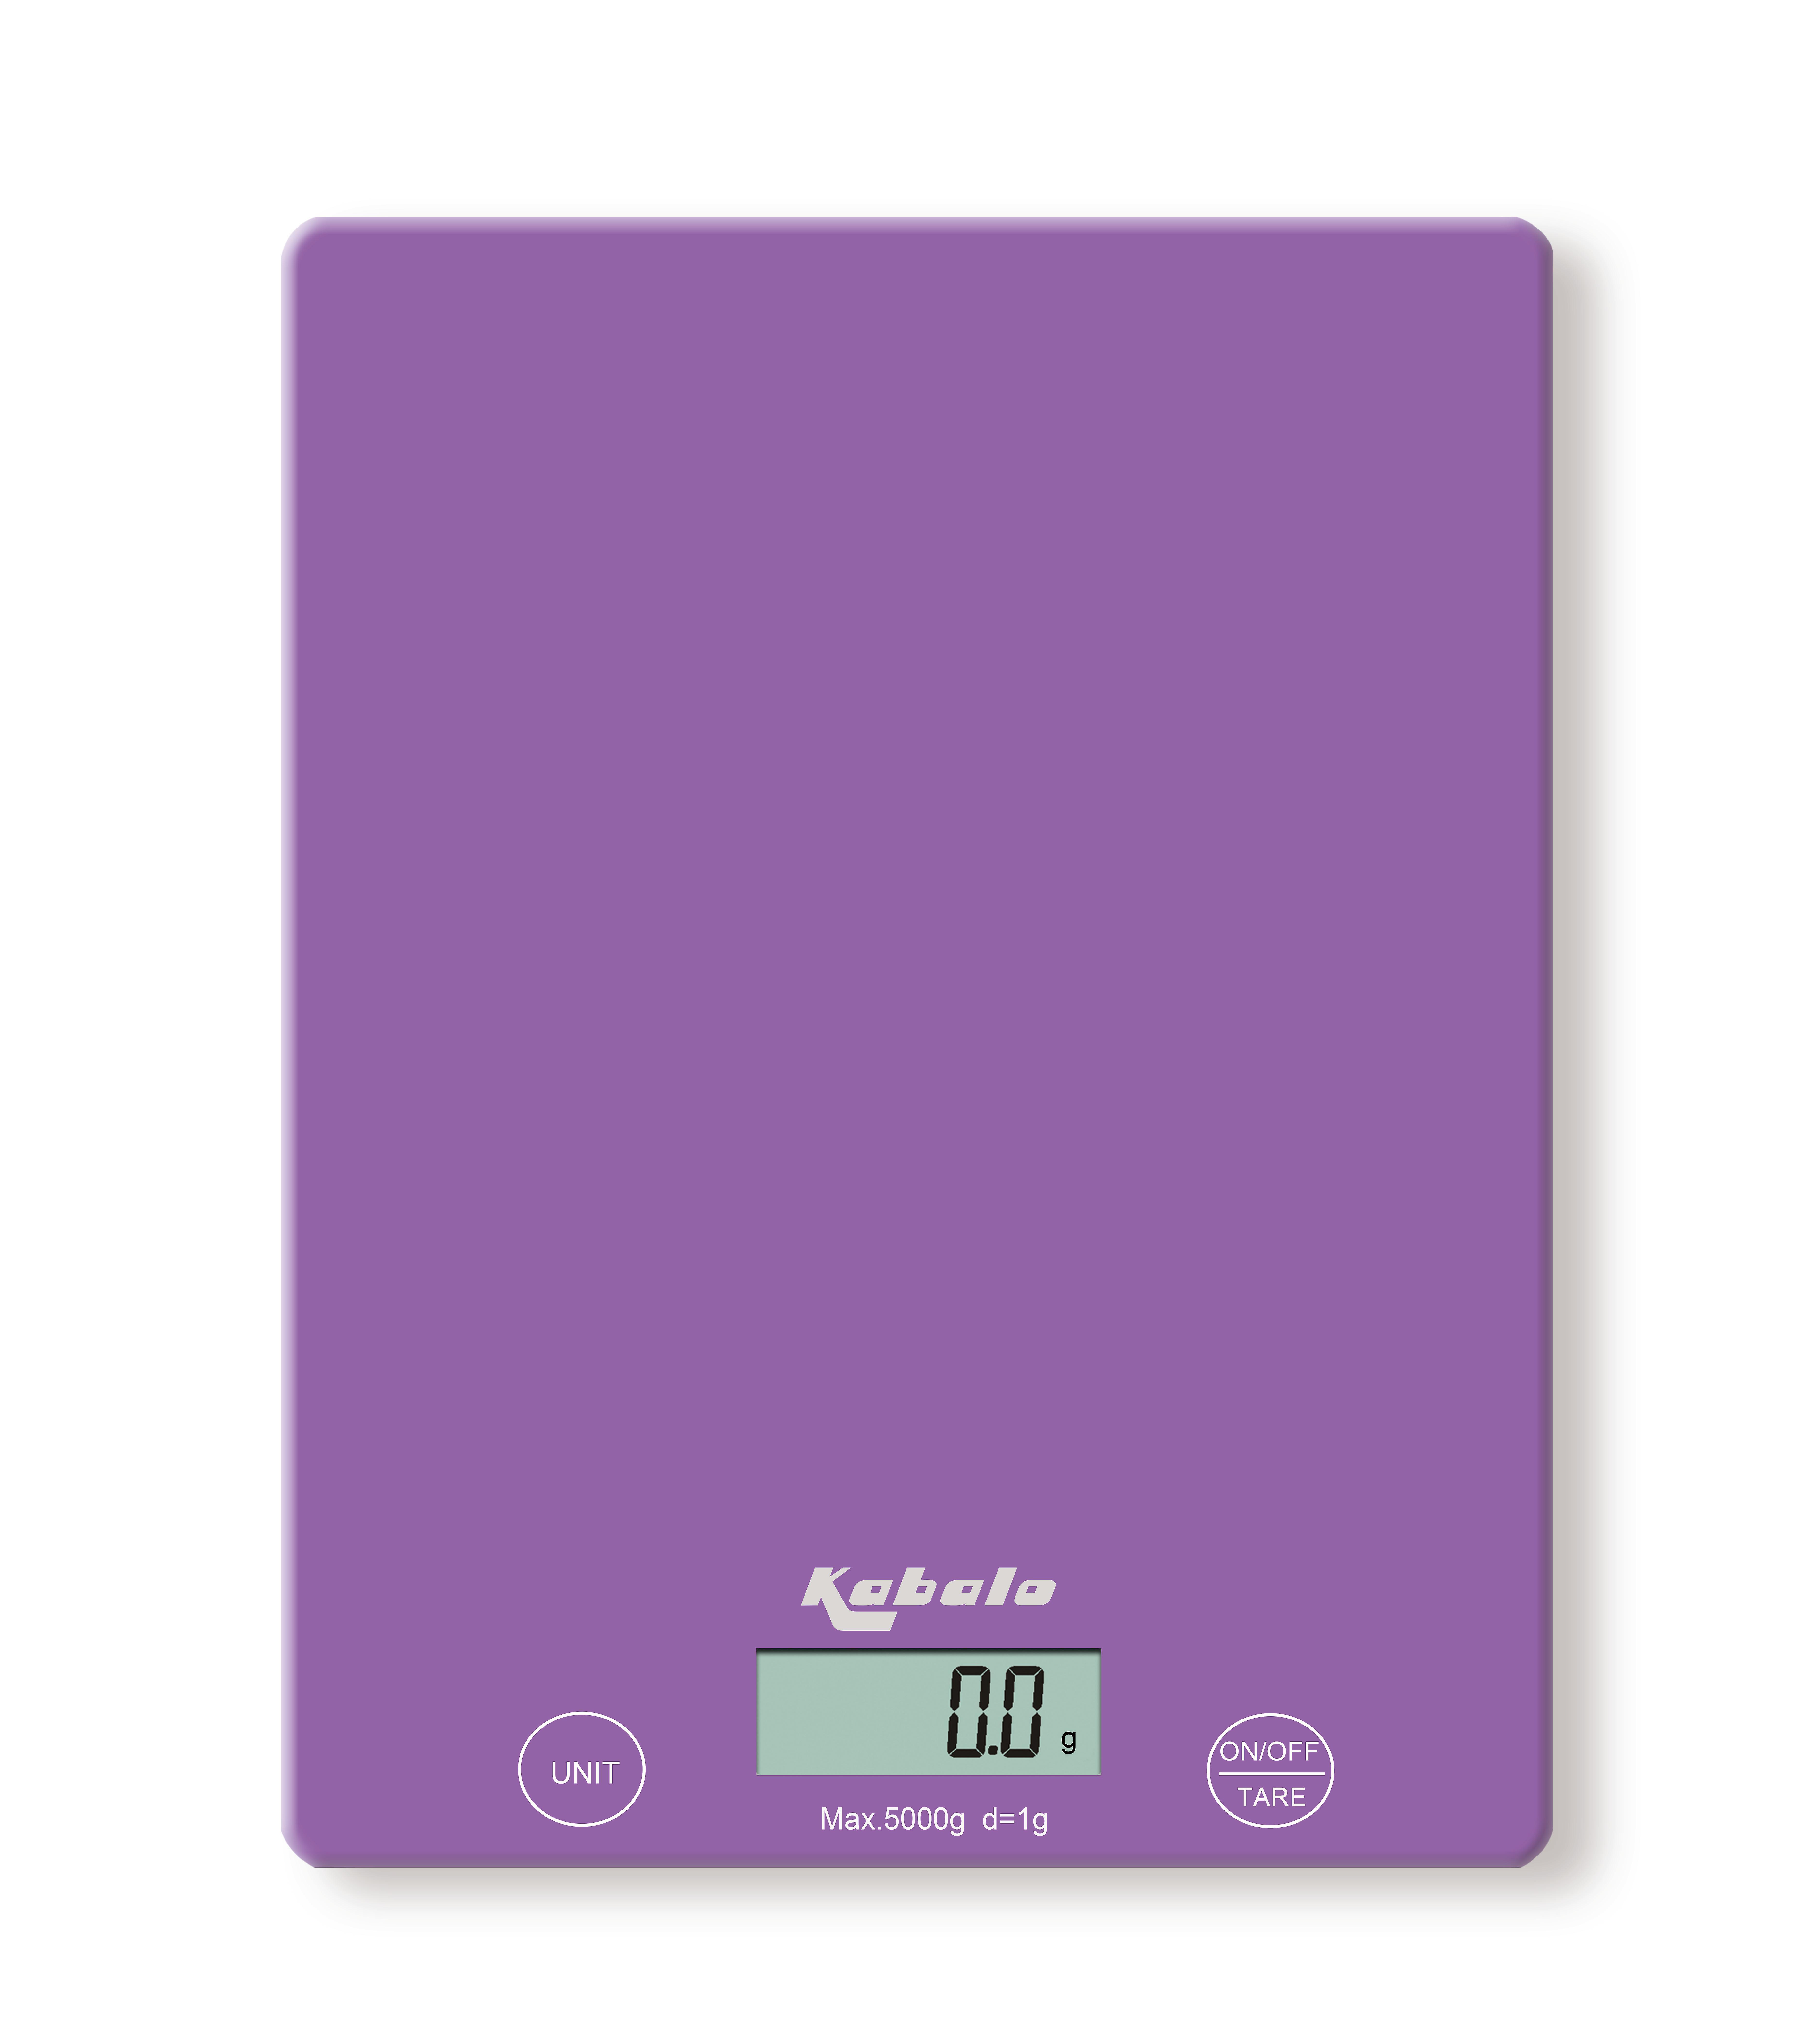 Kabalo 5kg Purple Digital LCD Electronic Kitchen Cooking Baking Prep Food Preparation Weighing Scales UK